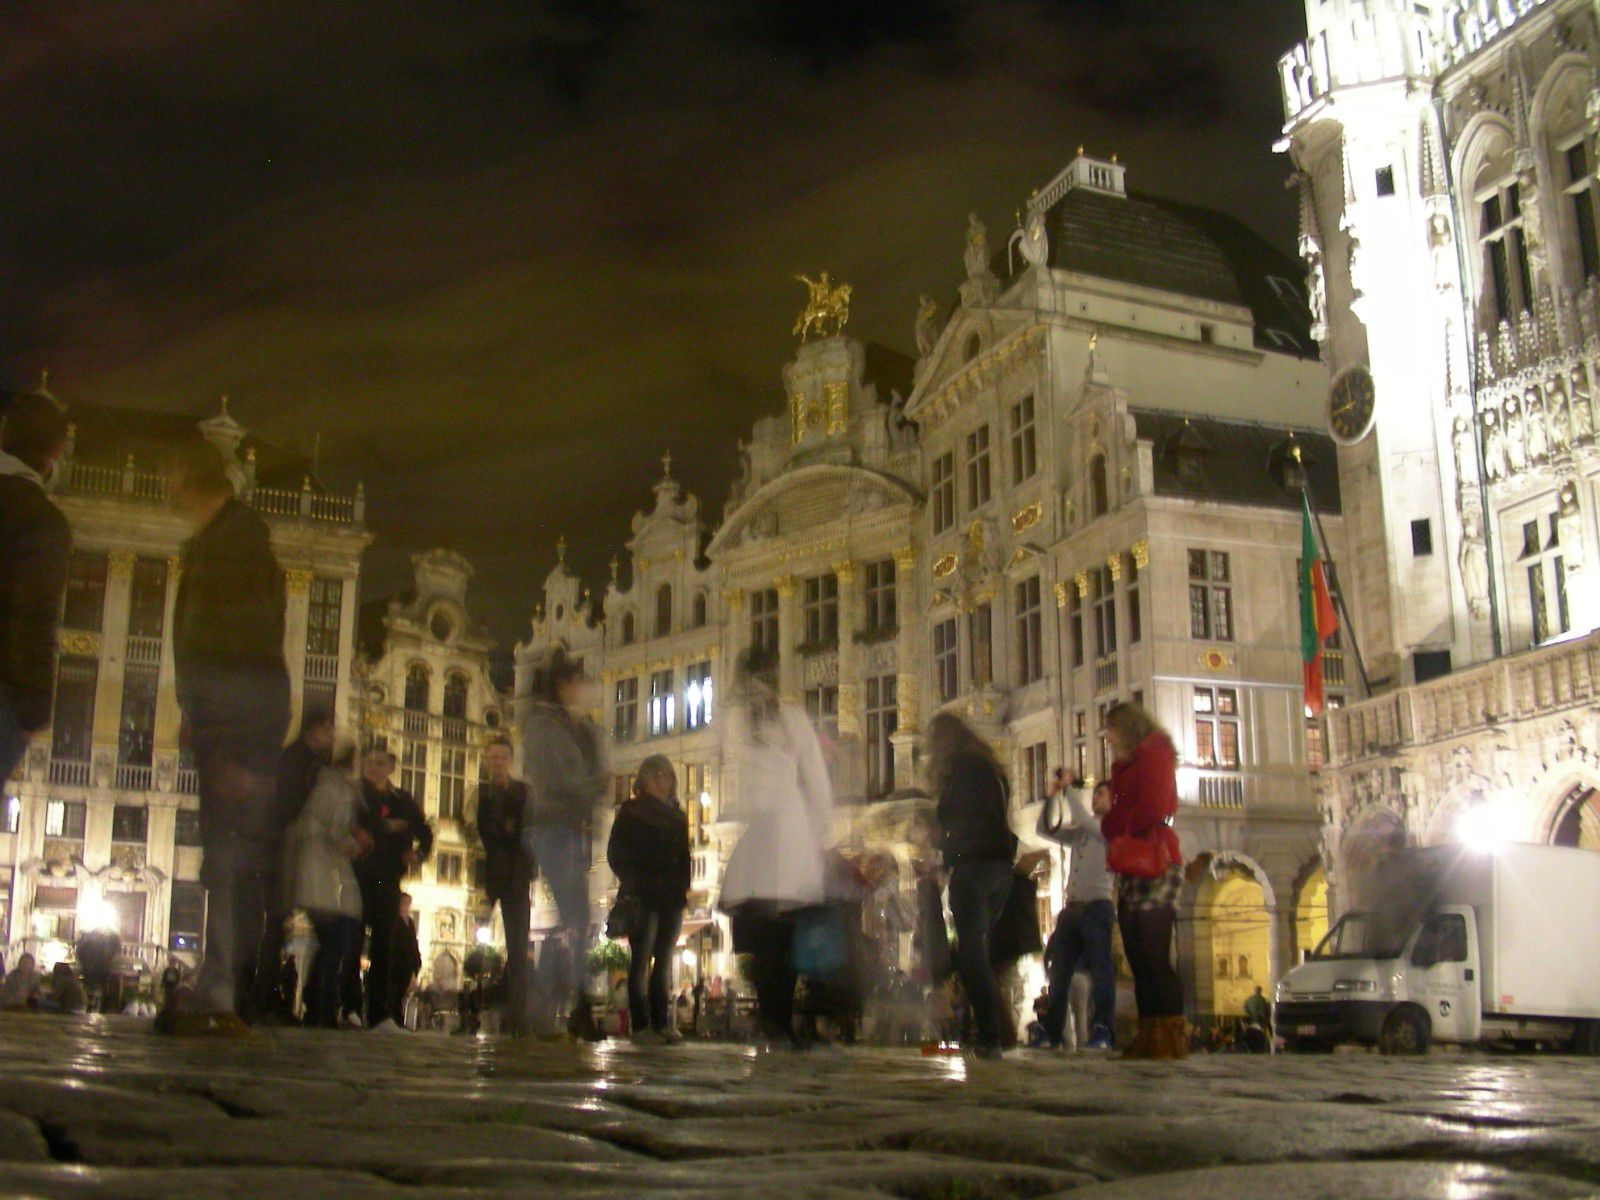 http://idata.over-blog.com/0/32/10/53/villes-geo-urbaine/Bruxelles.jpg